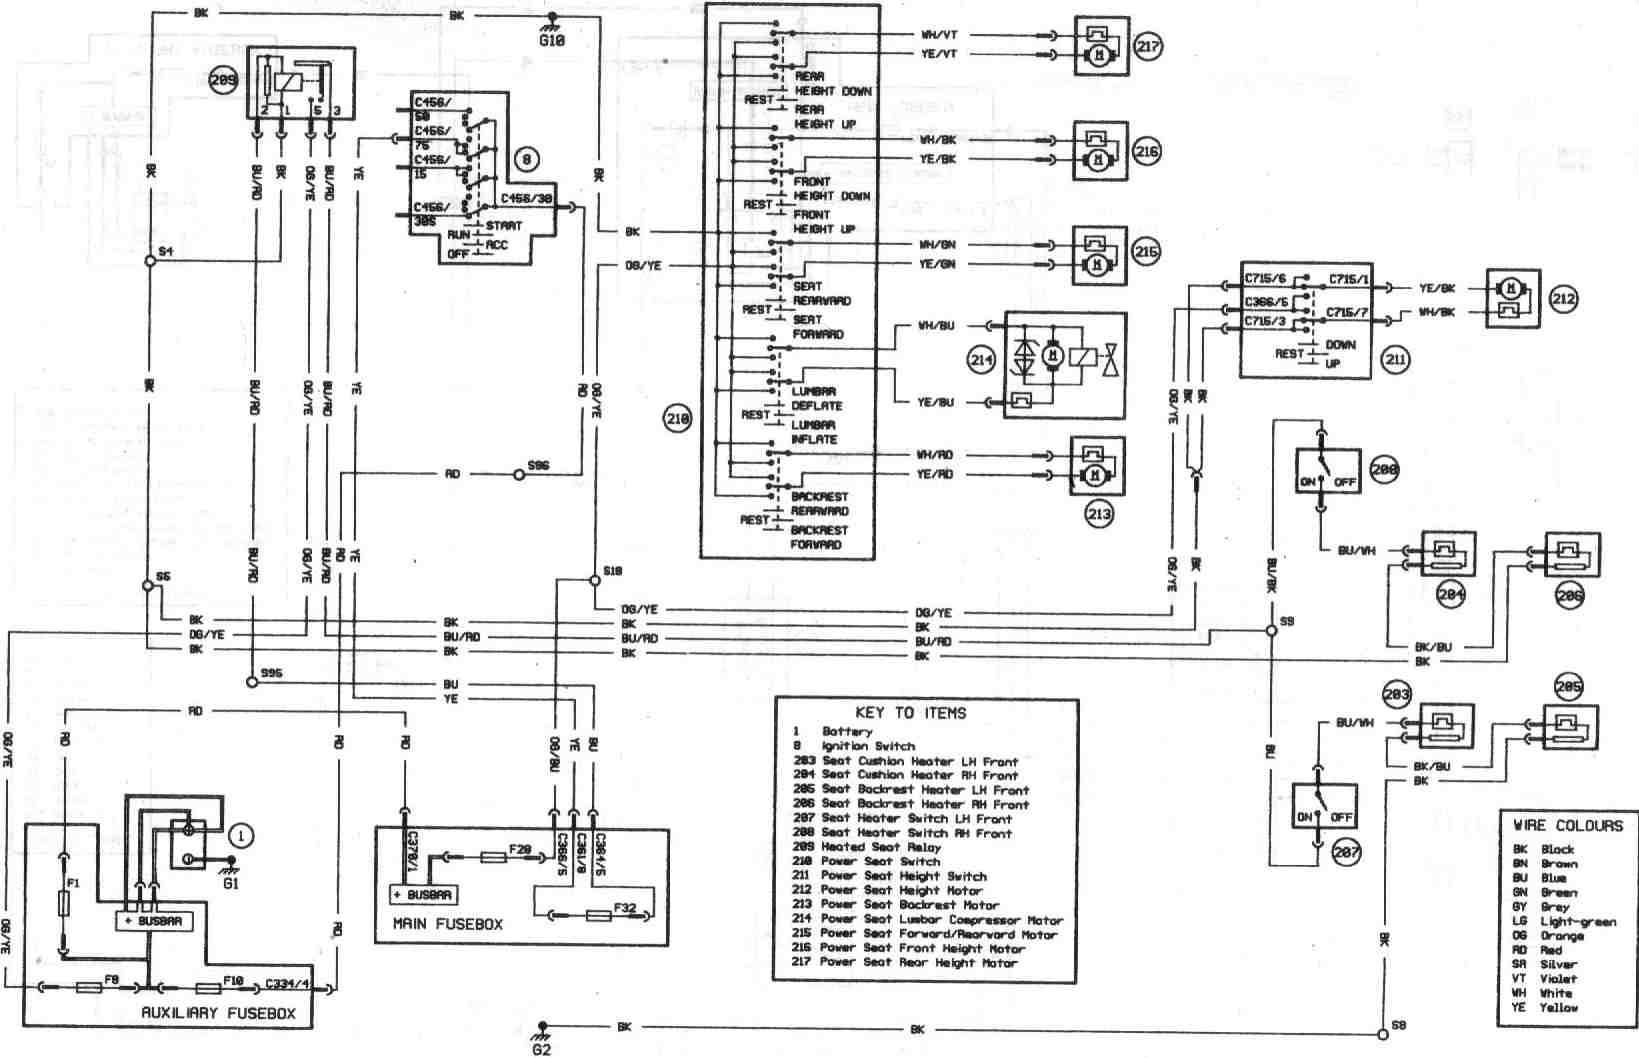 CE_1709] Ford Fiesta Heater Wiring Diagram Ford Ka Wiring Diagram Ford Ka Schematic  WiringDome Inama Opein Emba Mohammedshrine Librar Wiring 101